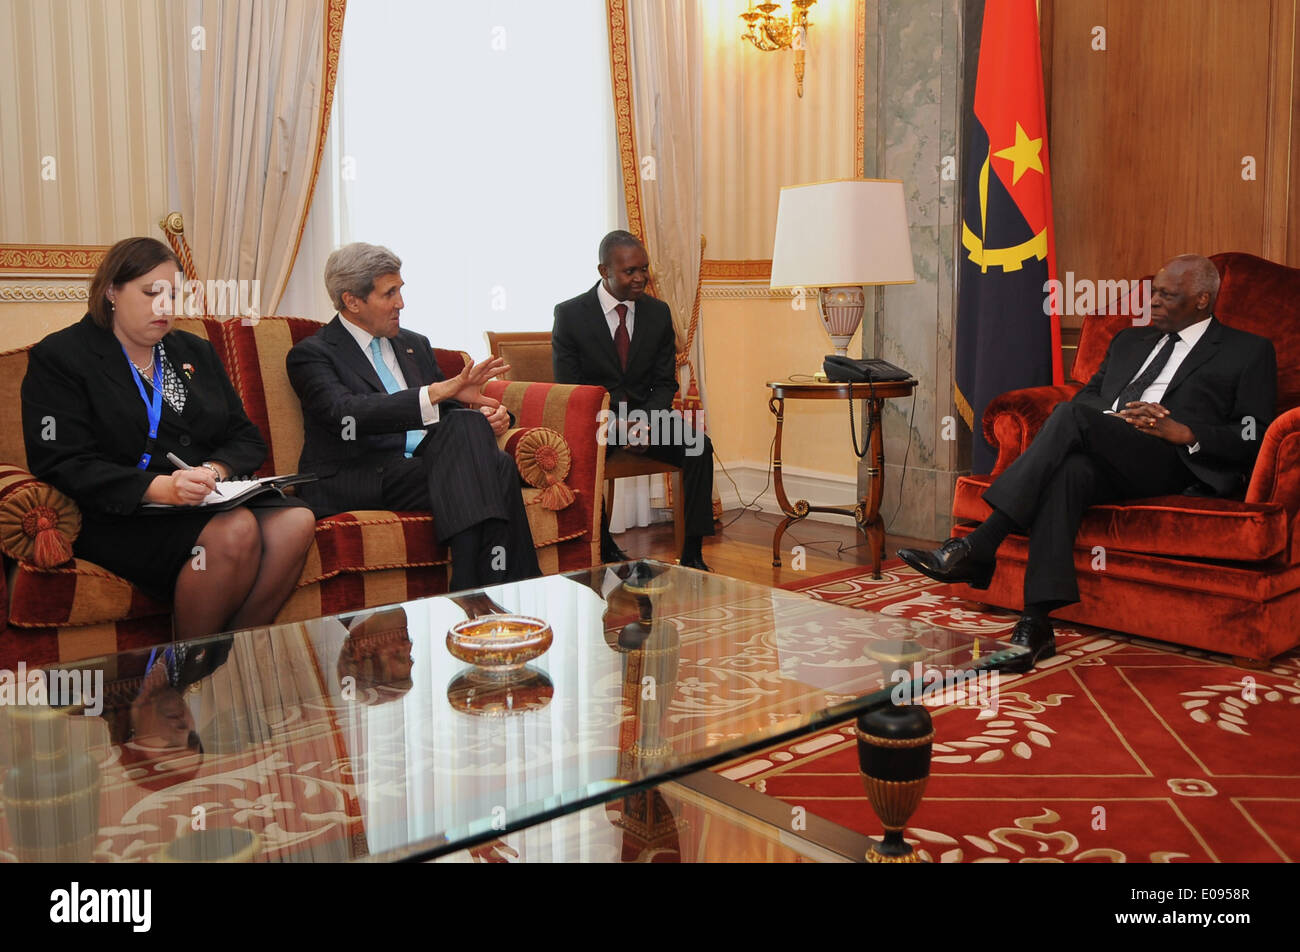 Secretary Kerry, Charge Merritt Meet With Angolan President dos Santos in Luanda - Stock Image